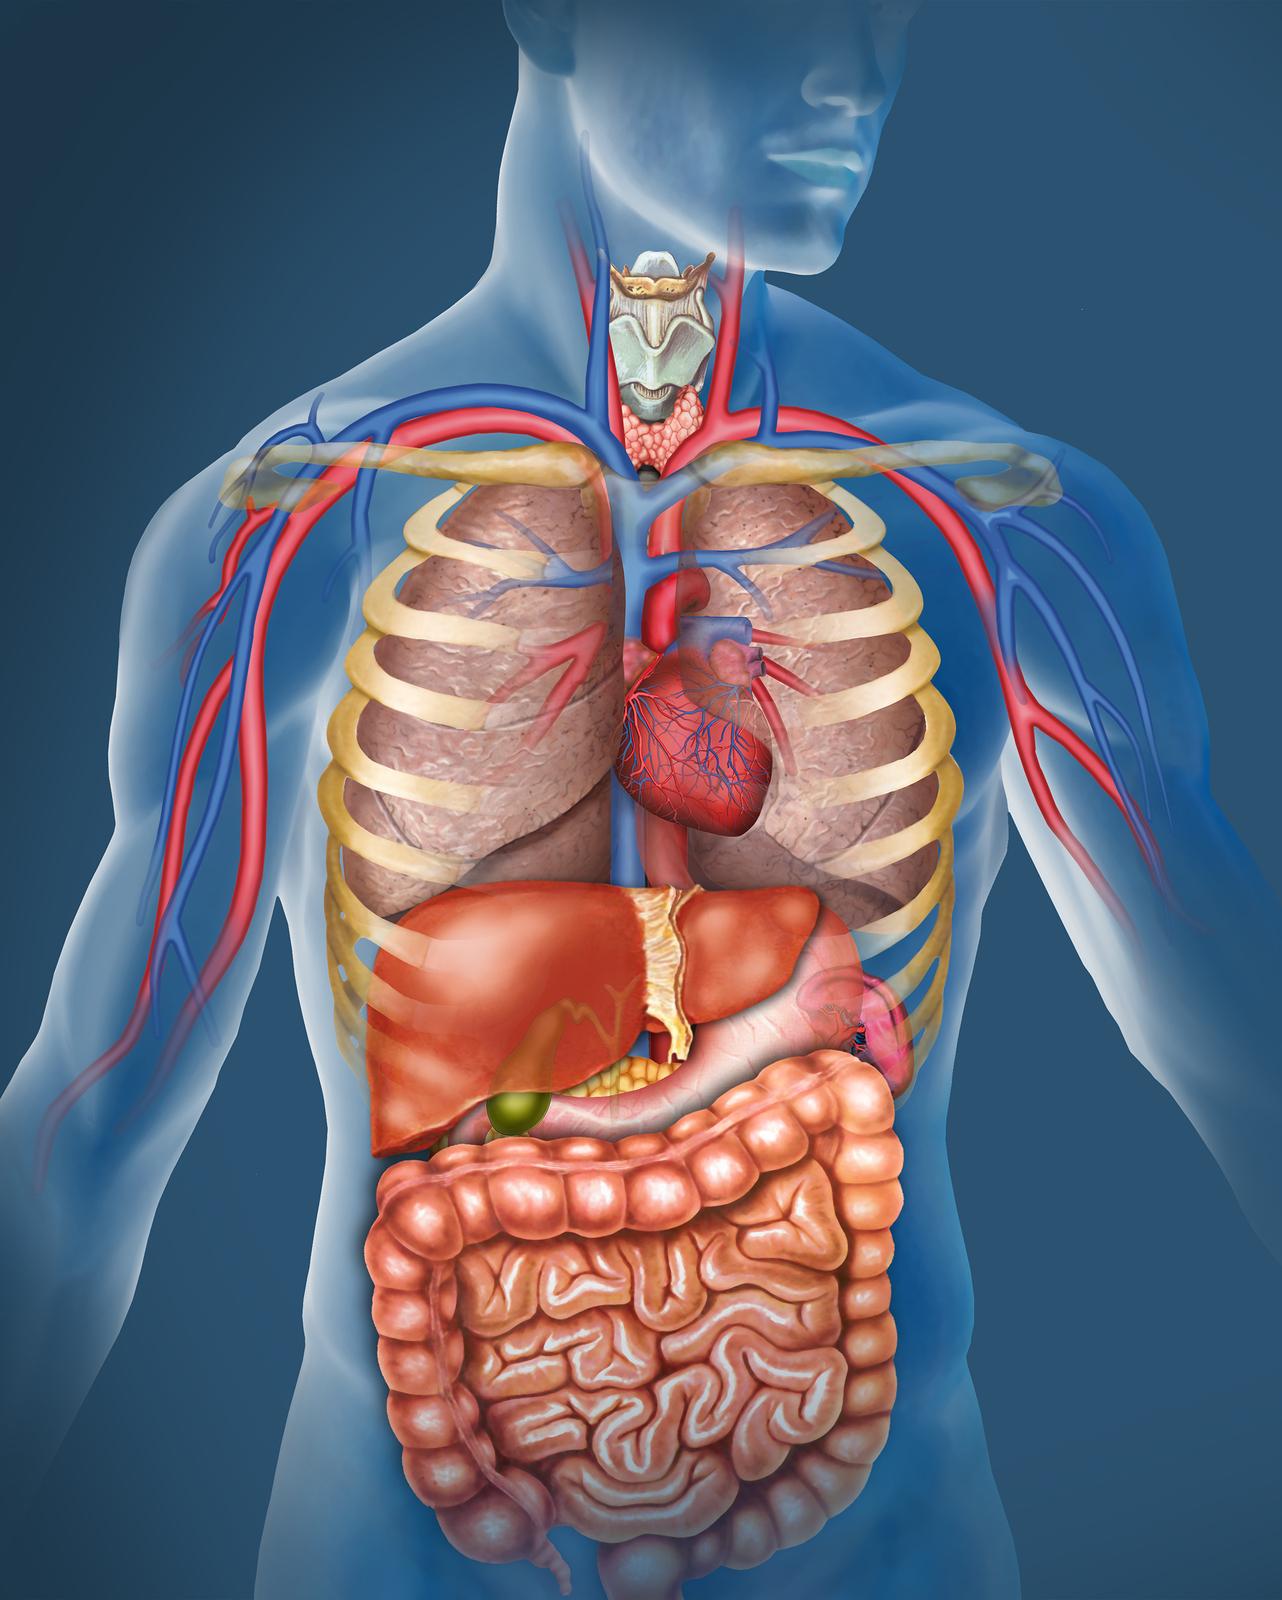 improve our abdominal health